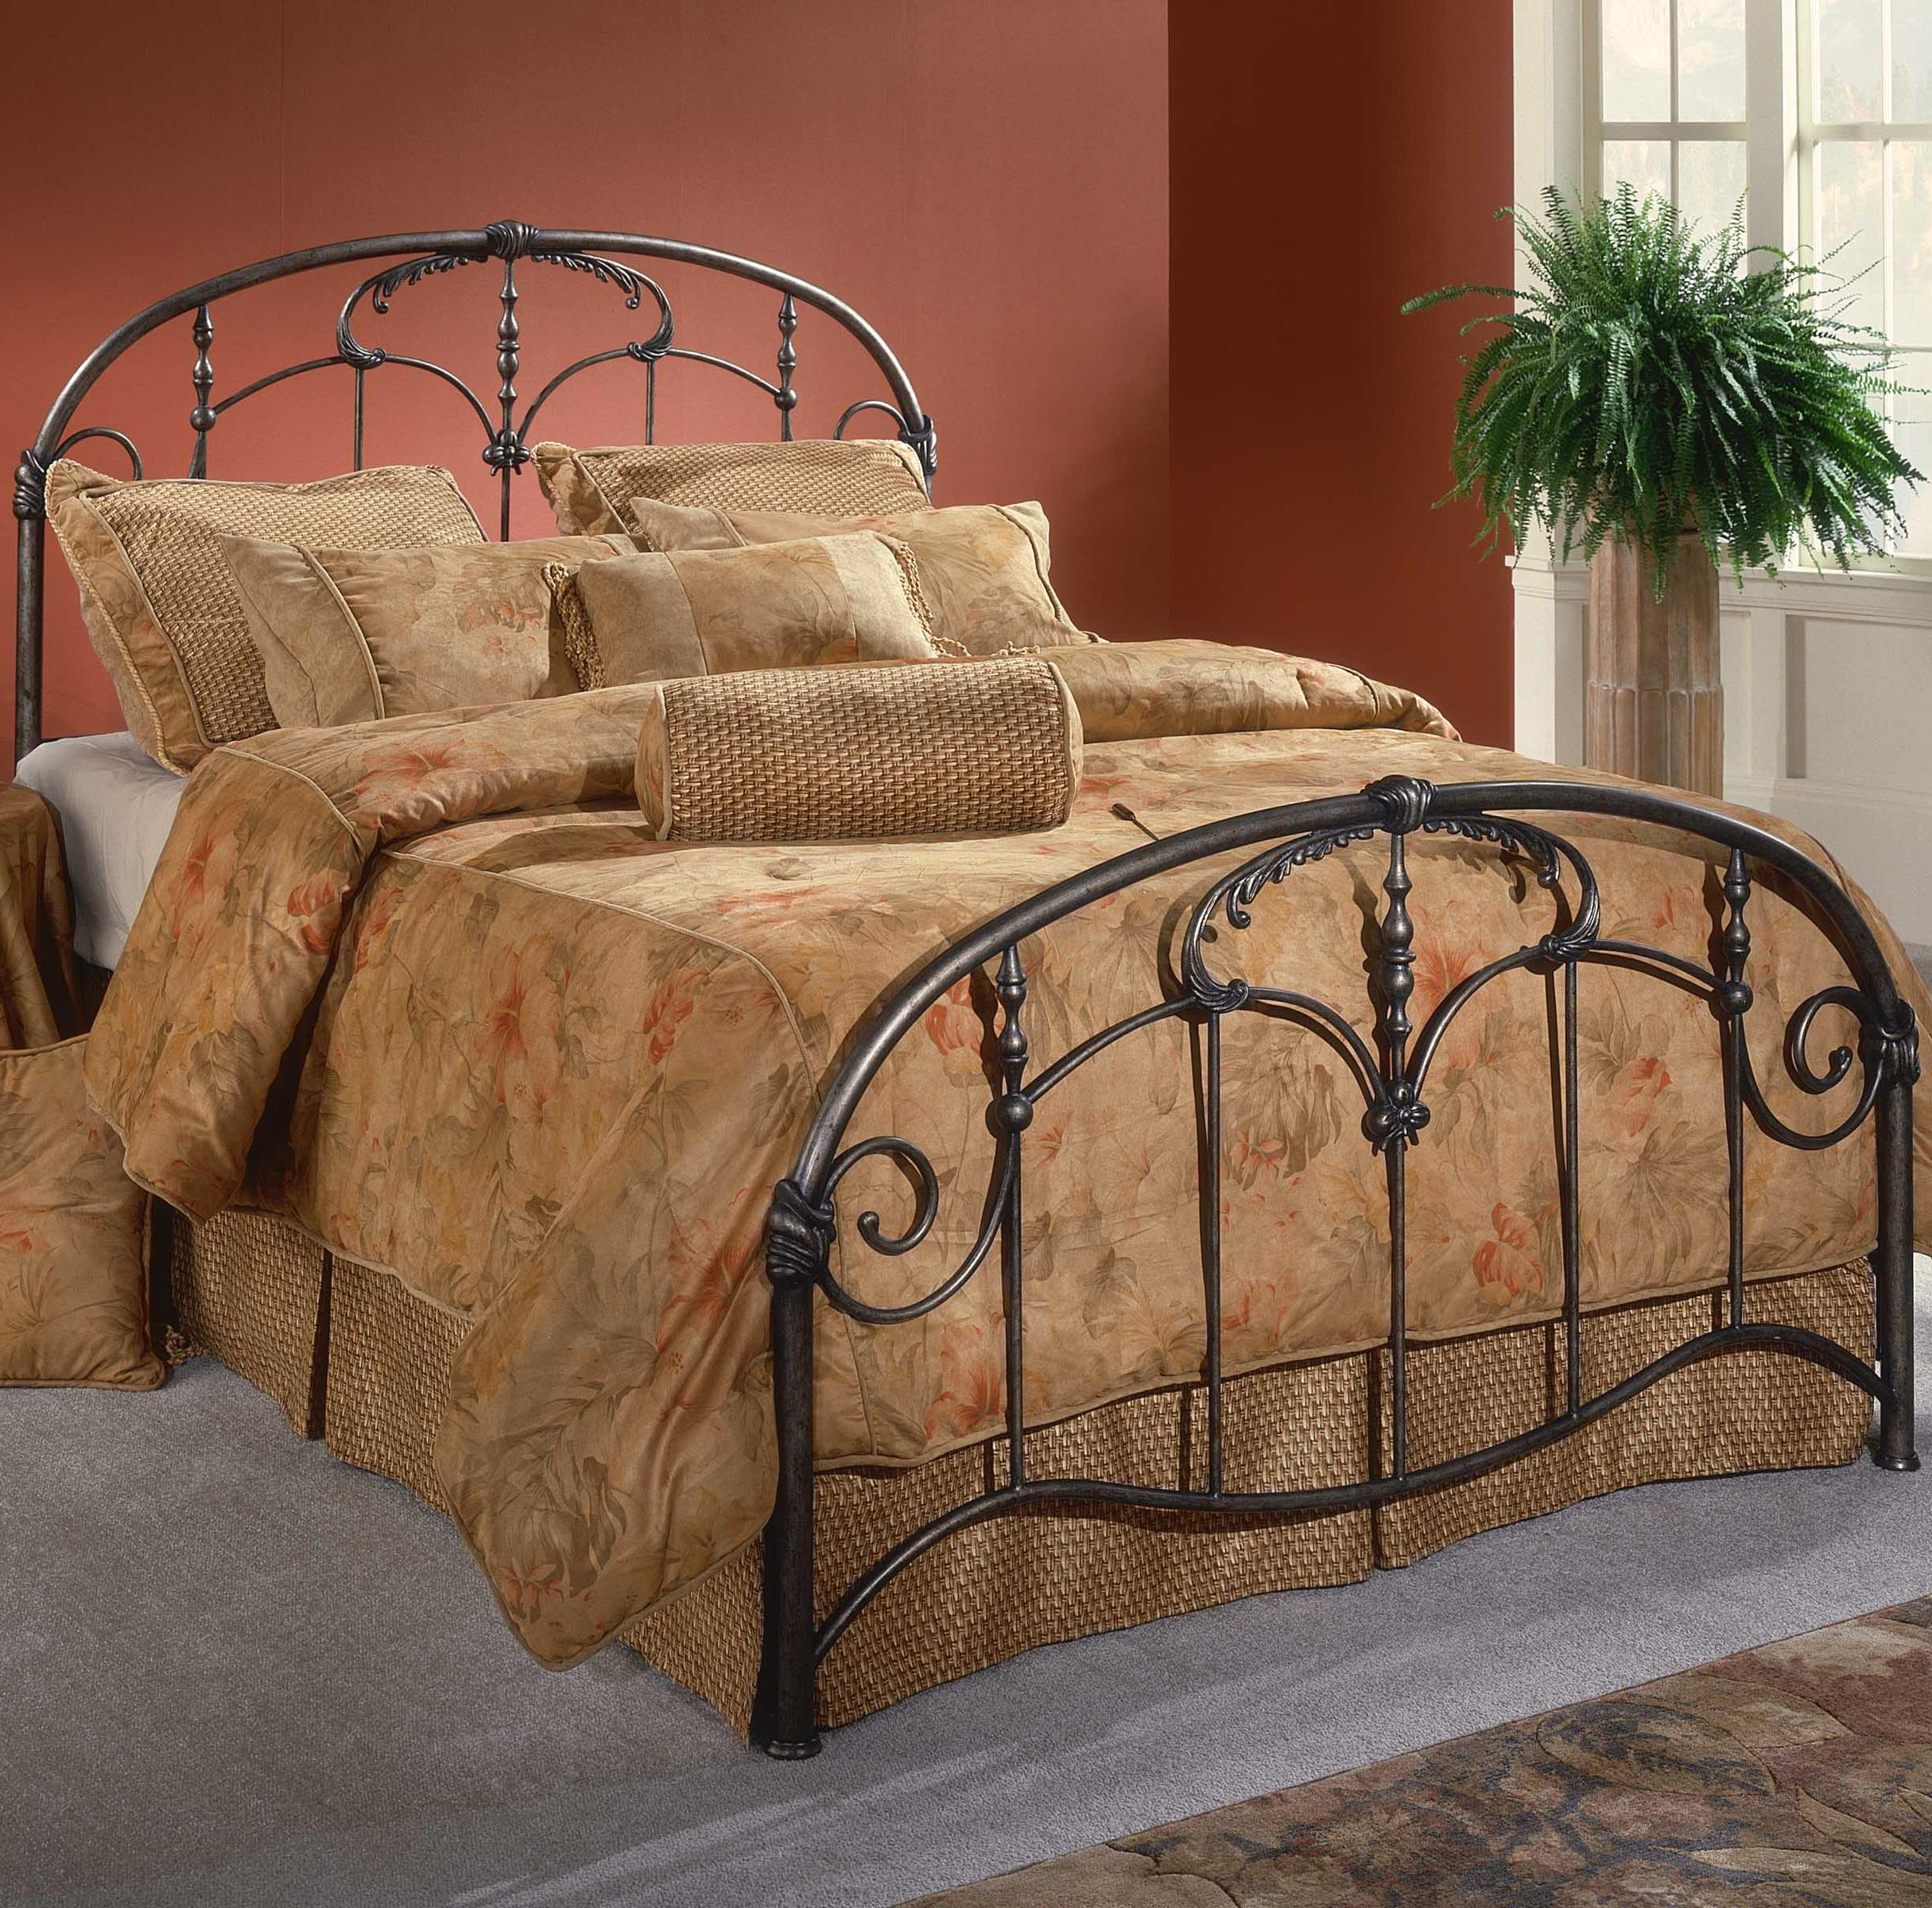 Metal Beds King Jacqueline Bed by Hillsdale at Steger's Furniture